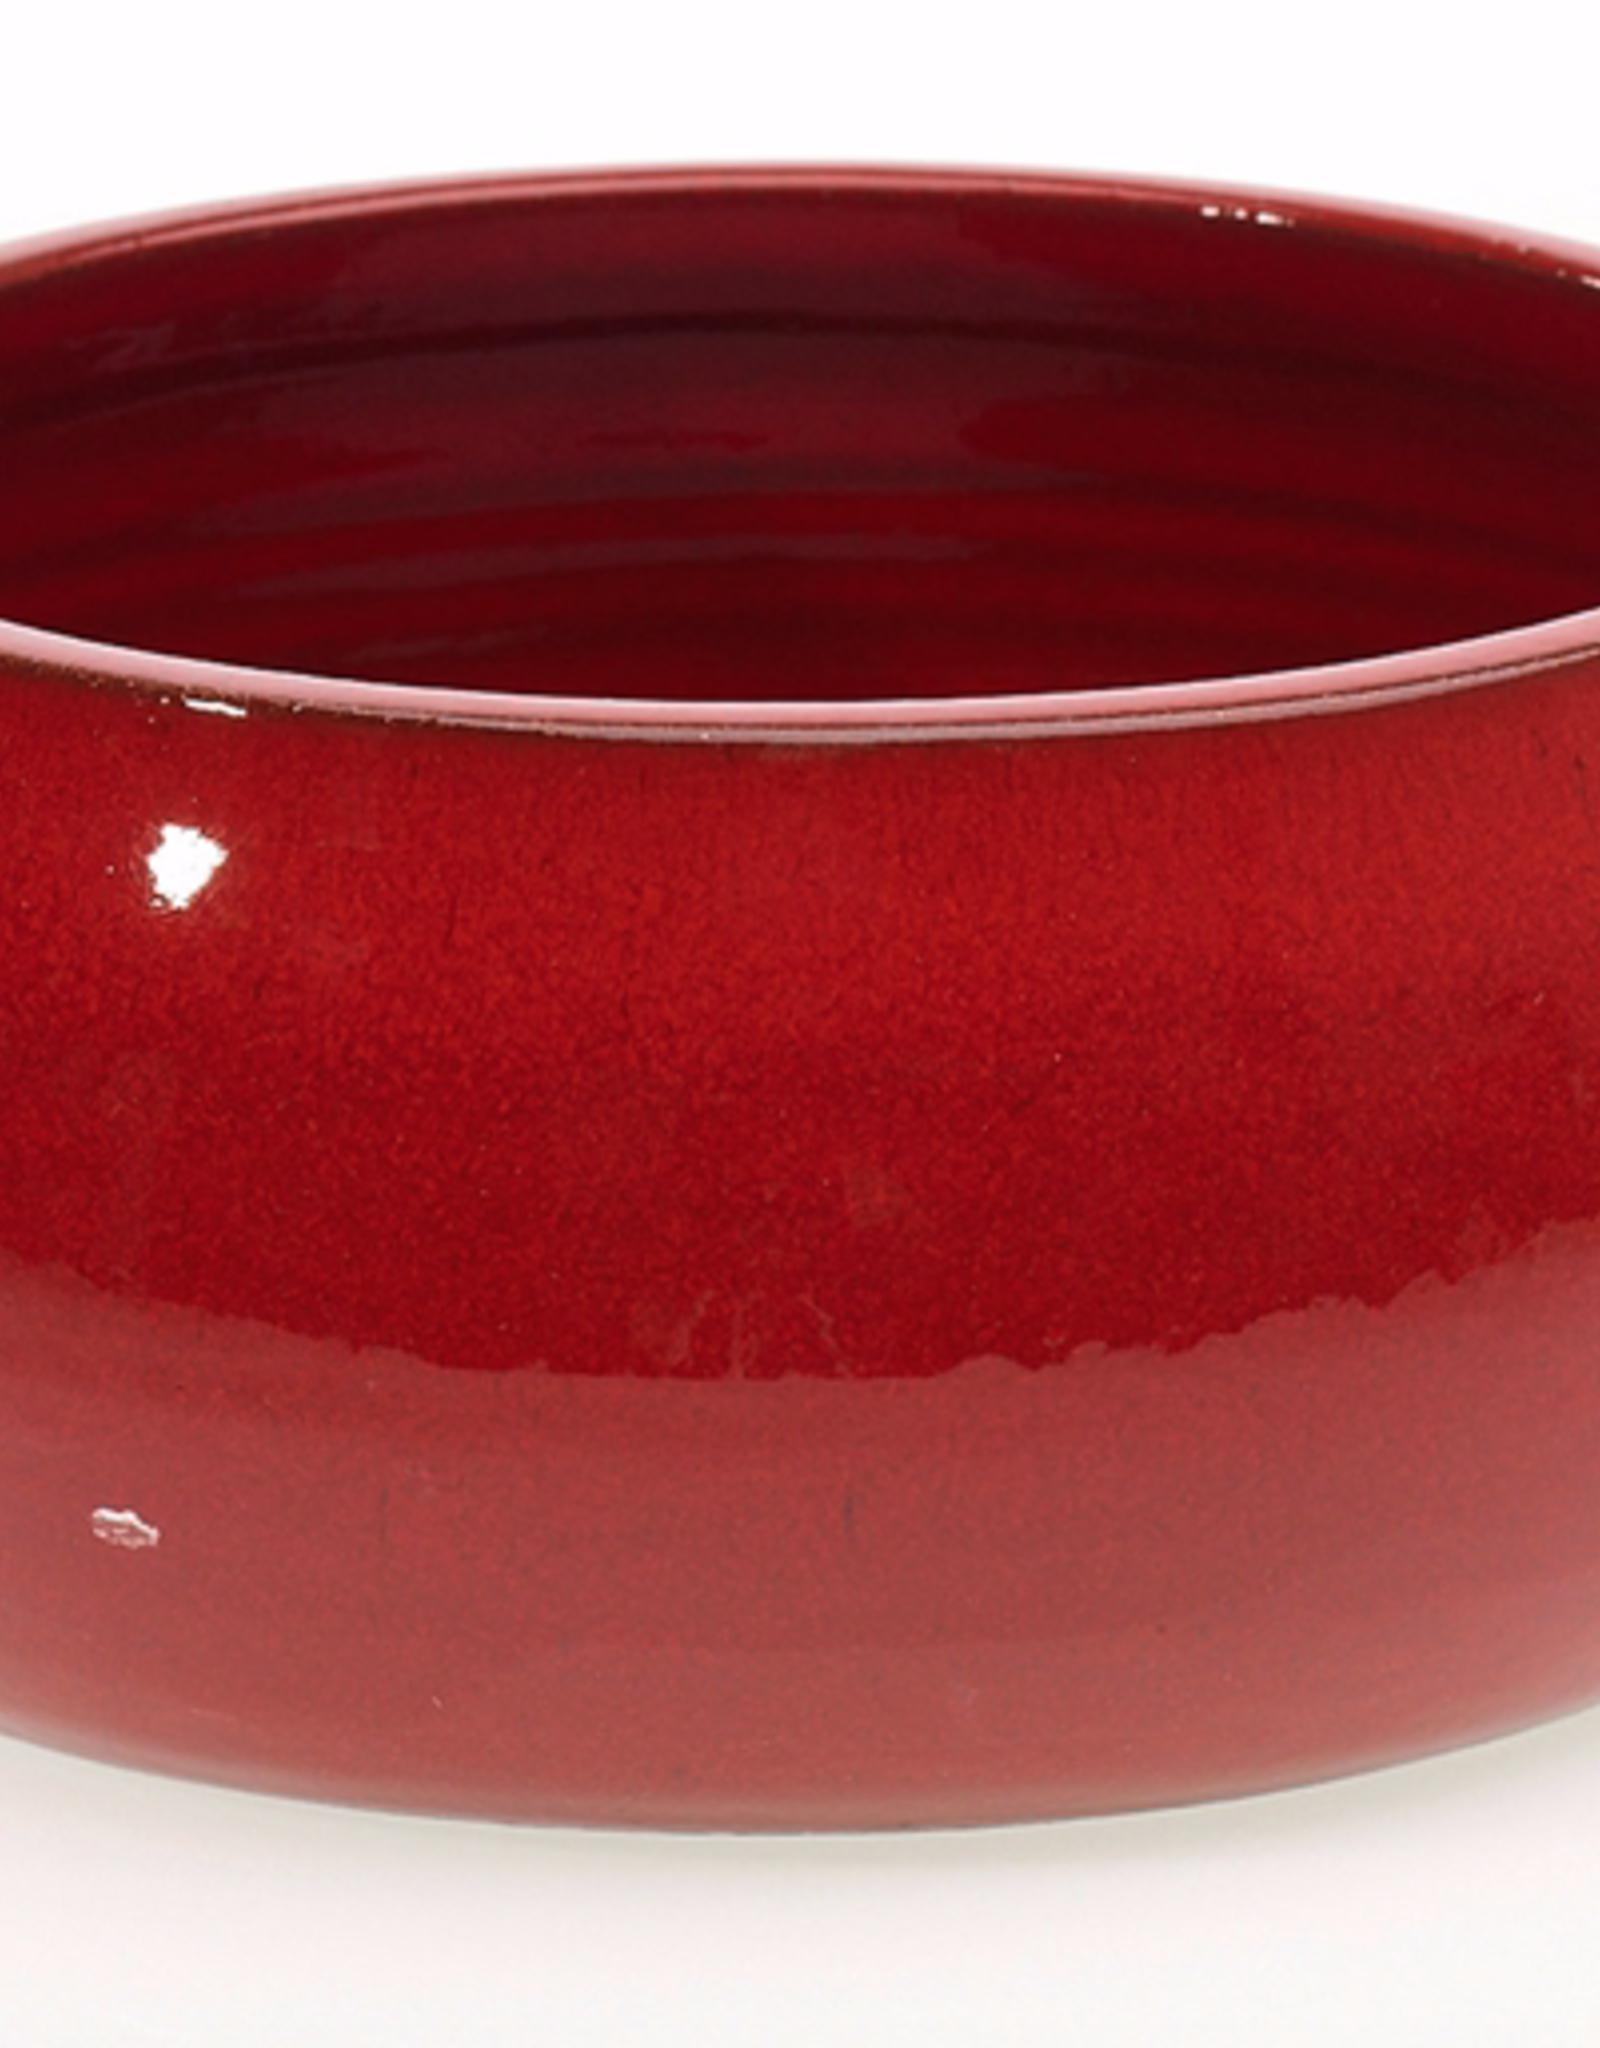 "AD Turner Bowl - Red - 10.25"" x 4.75"" - Ceramic"